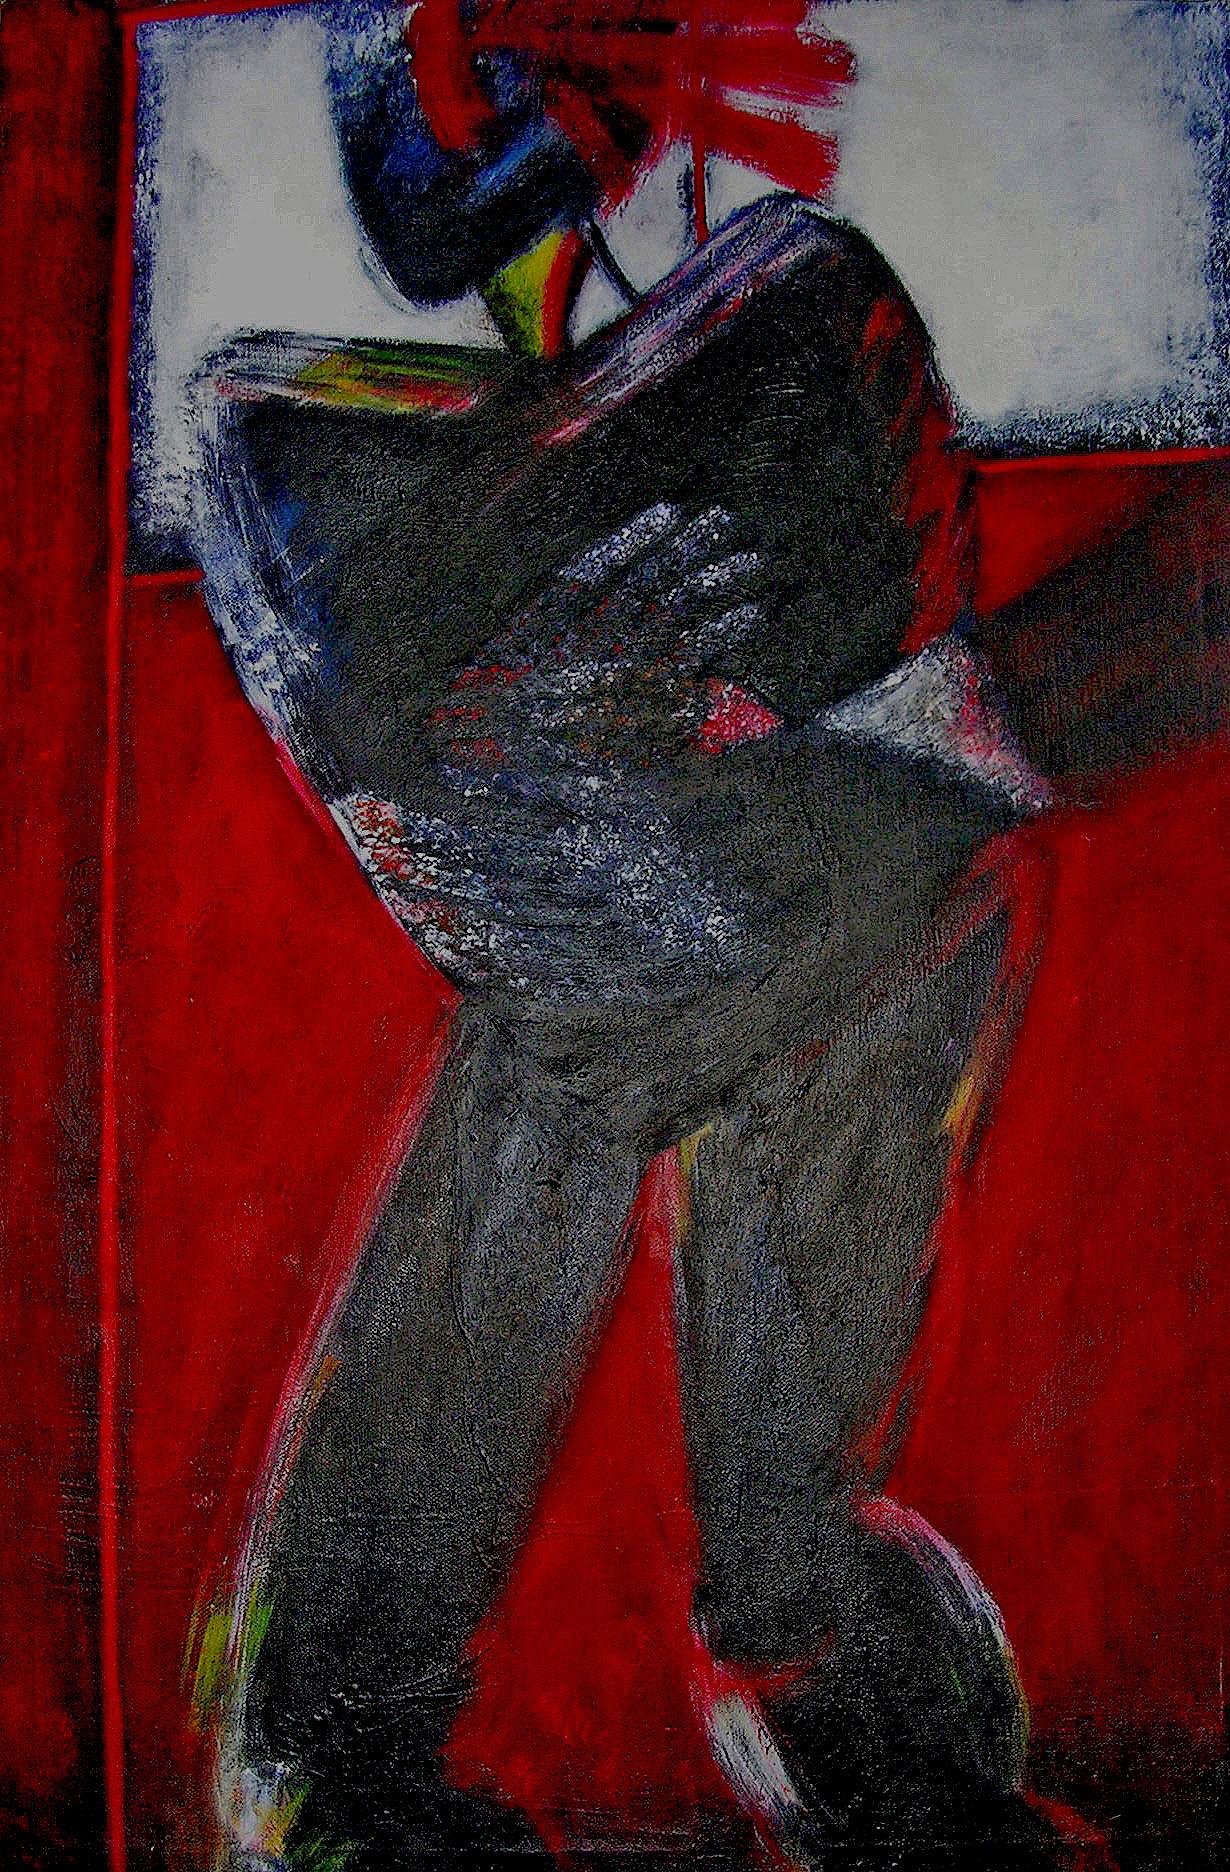 Self portrait in red (2002)